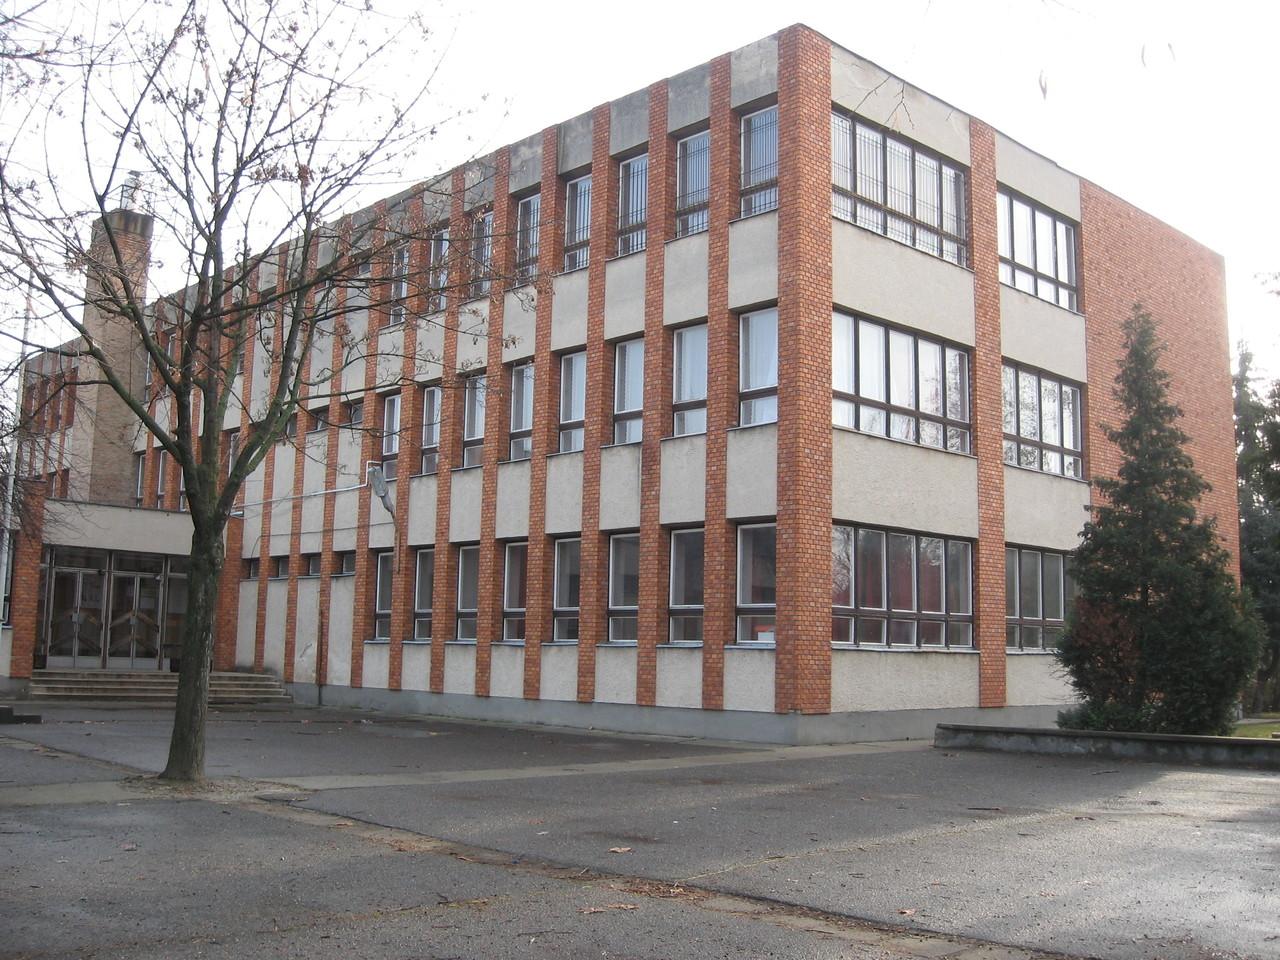 Domosod - School